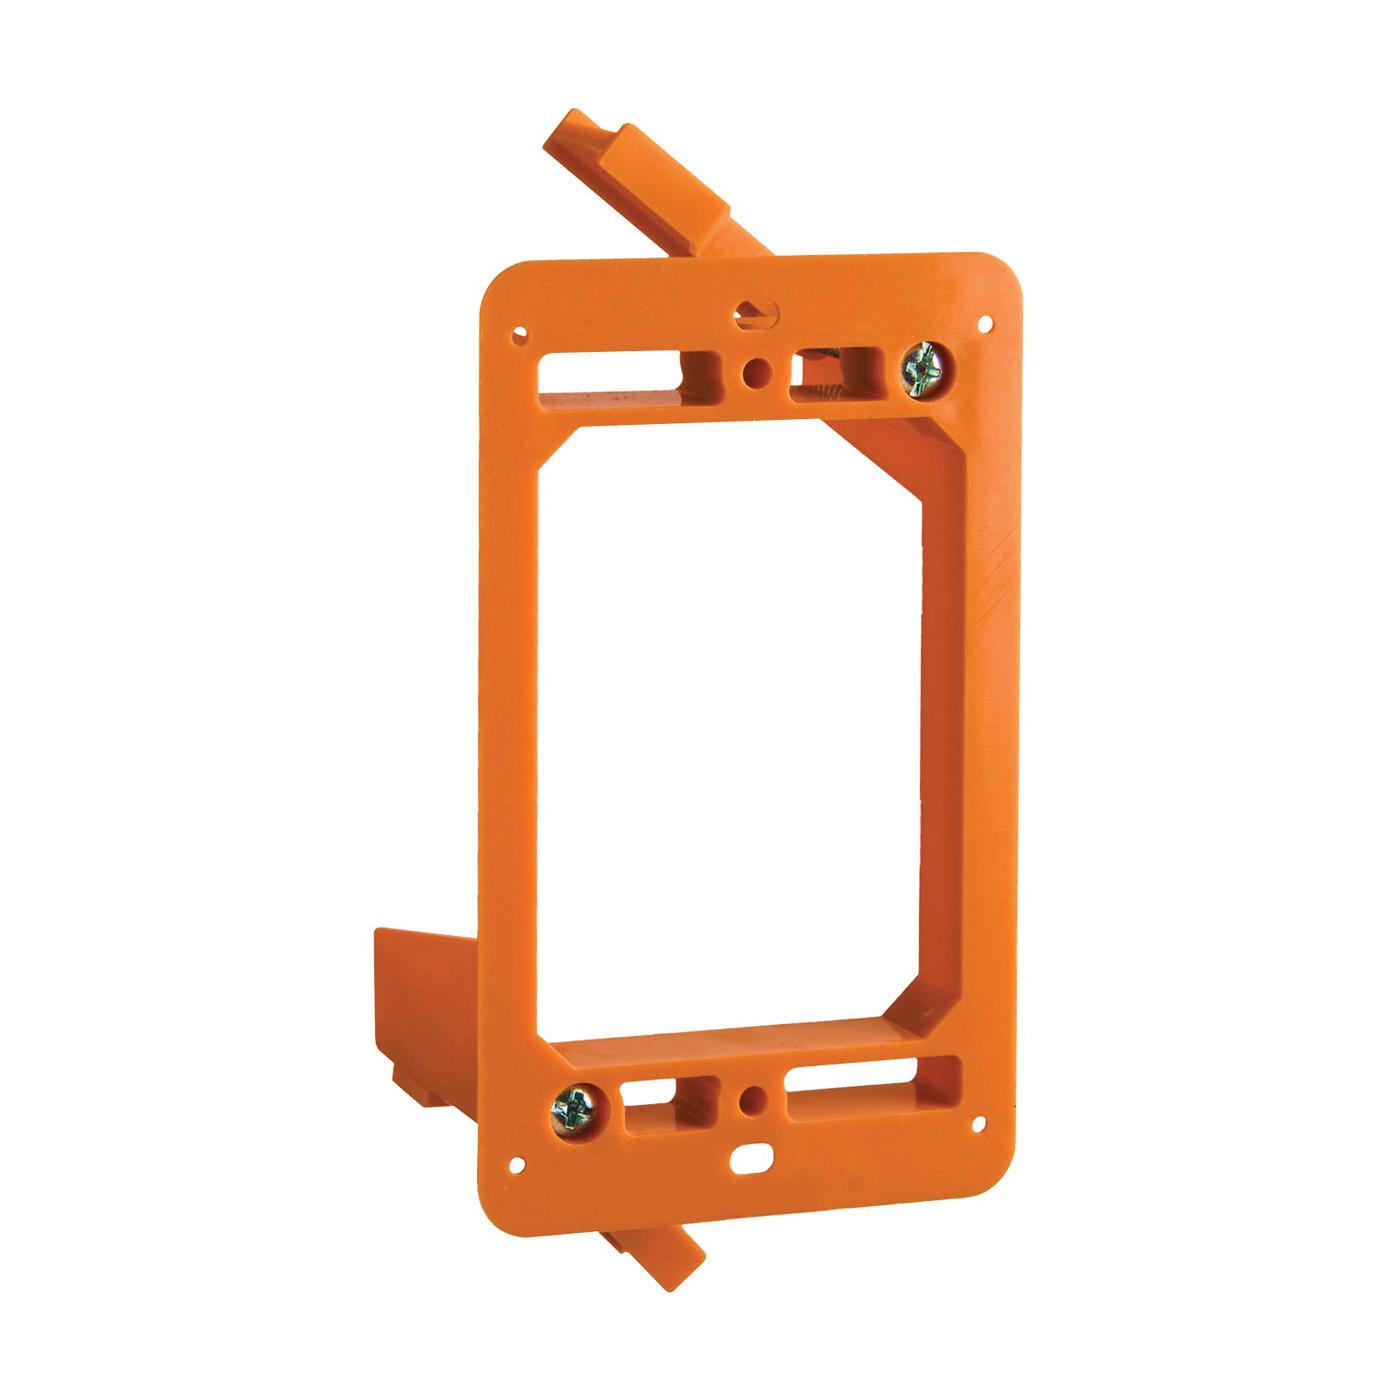 Picture of Carlon SC100RR Outlet Box, 4.32 in L, 2.52 in W, 1-Gang, Non-Metallic, Orange